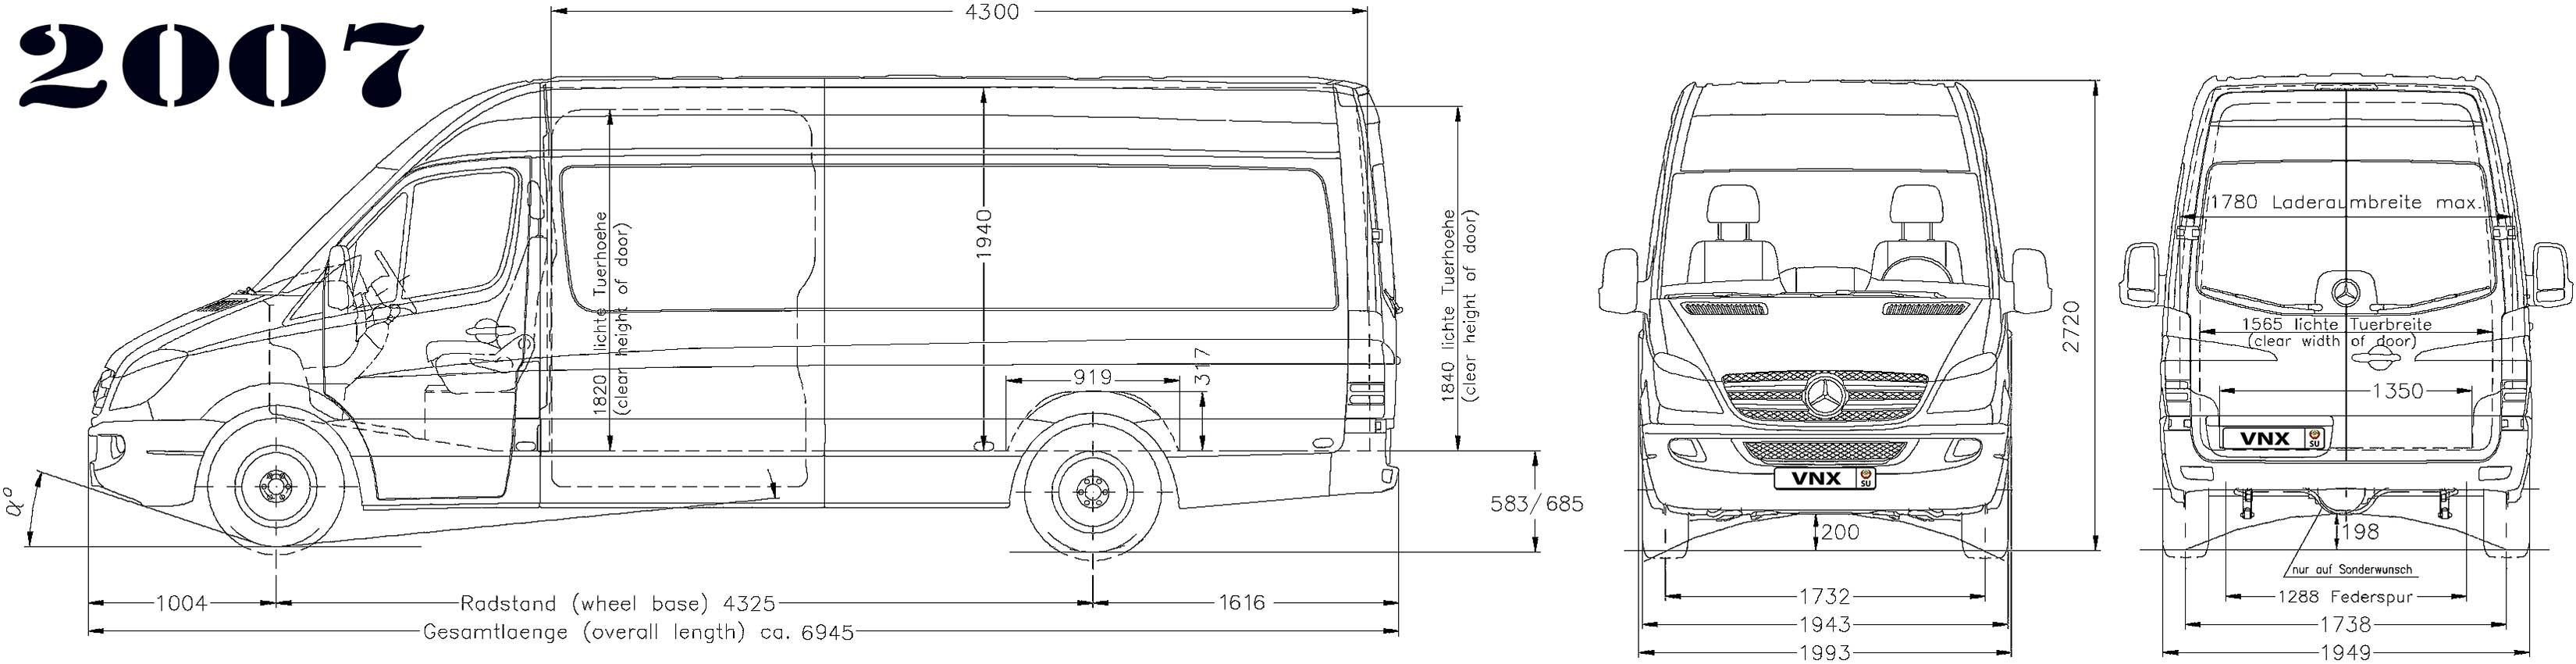 Габаритные размеры Мерседес-Бенц Спринтер 2006-2013 (dimensions Mercedes-Benz Sprinter W906)